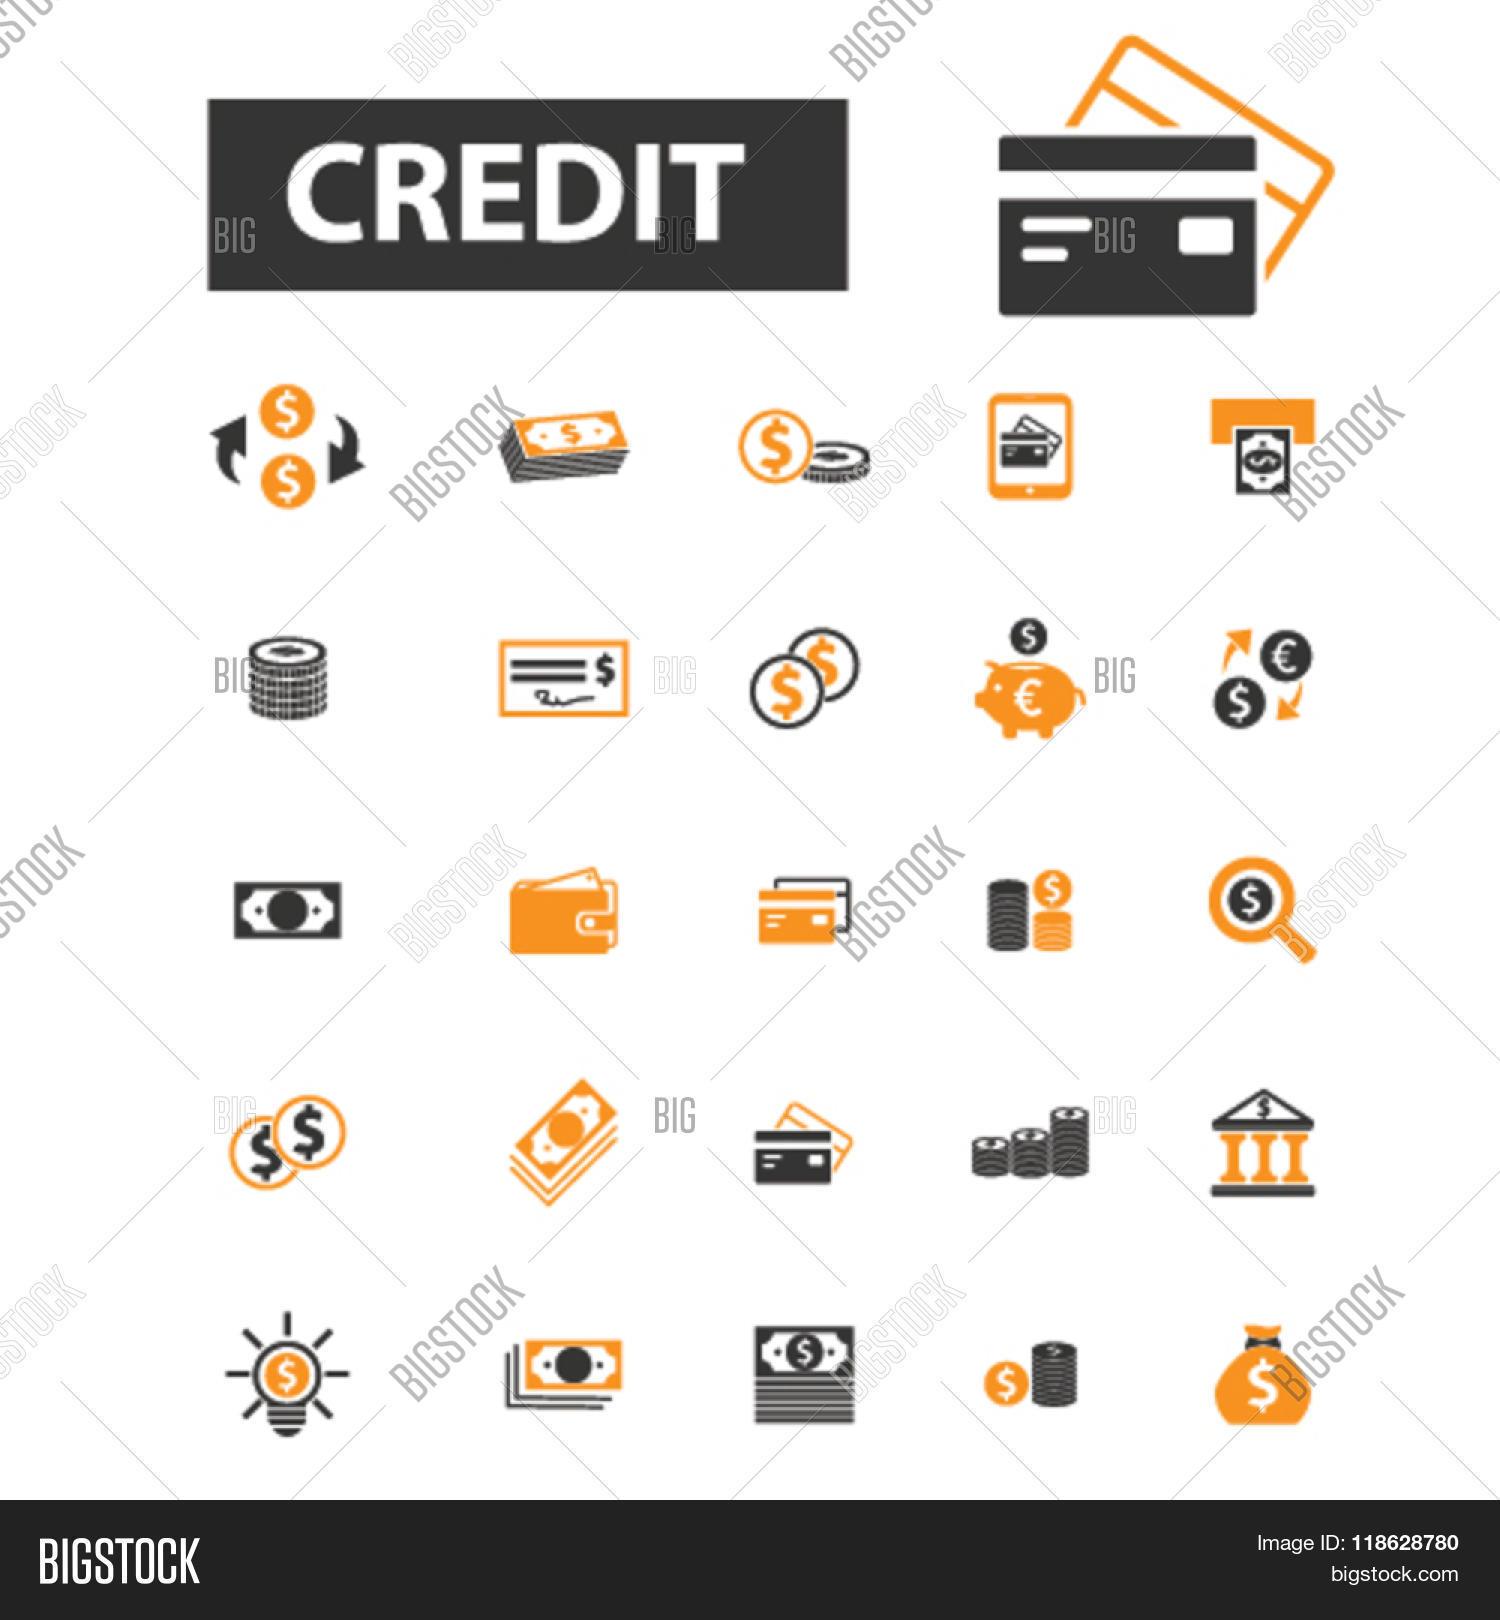 Credit Icons, Credit Logo, Vector & Photo | Bigstock